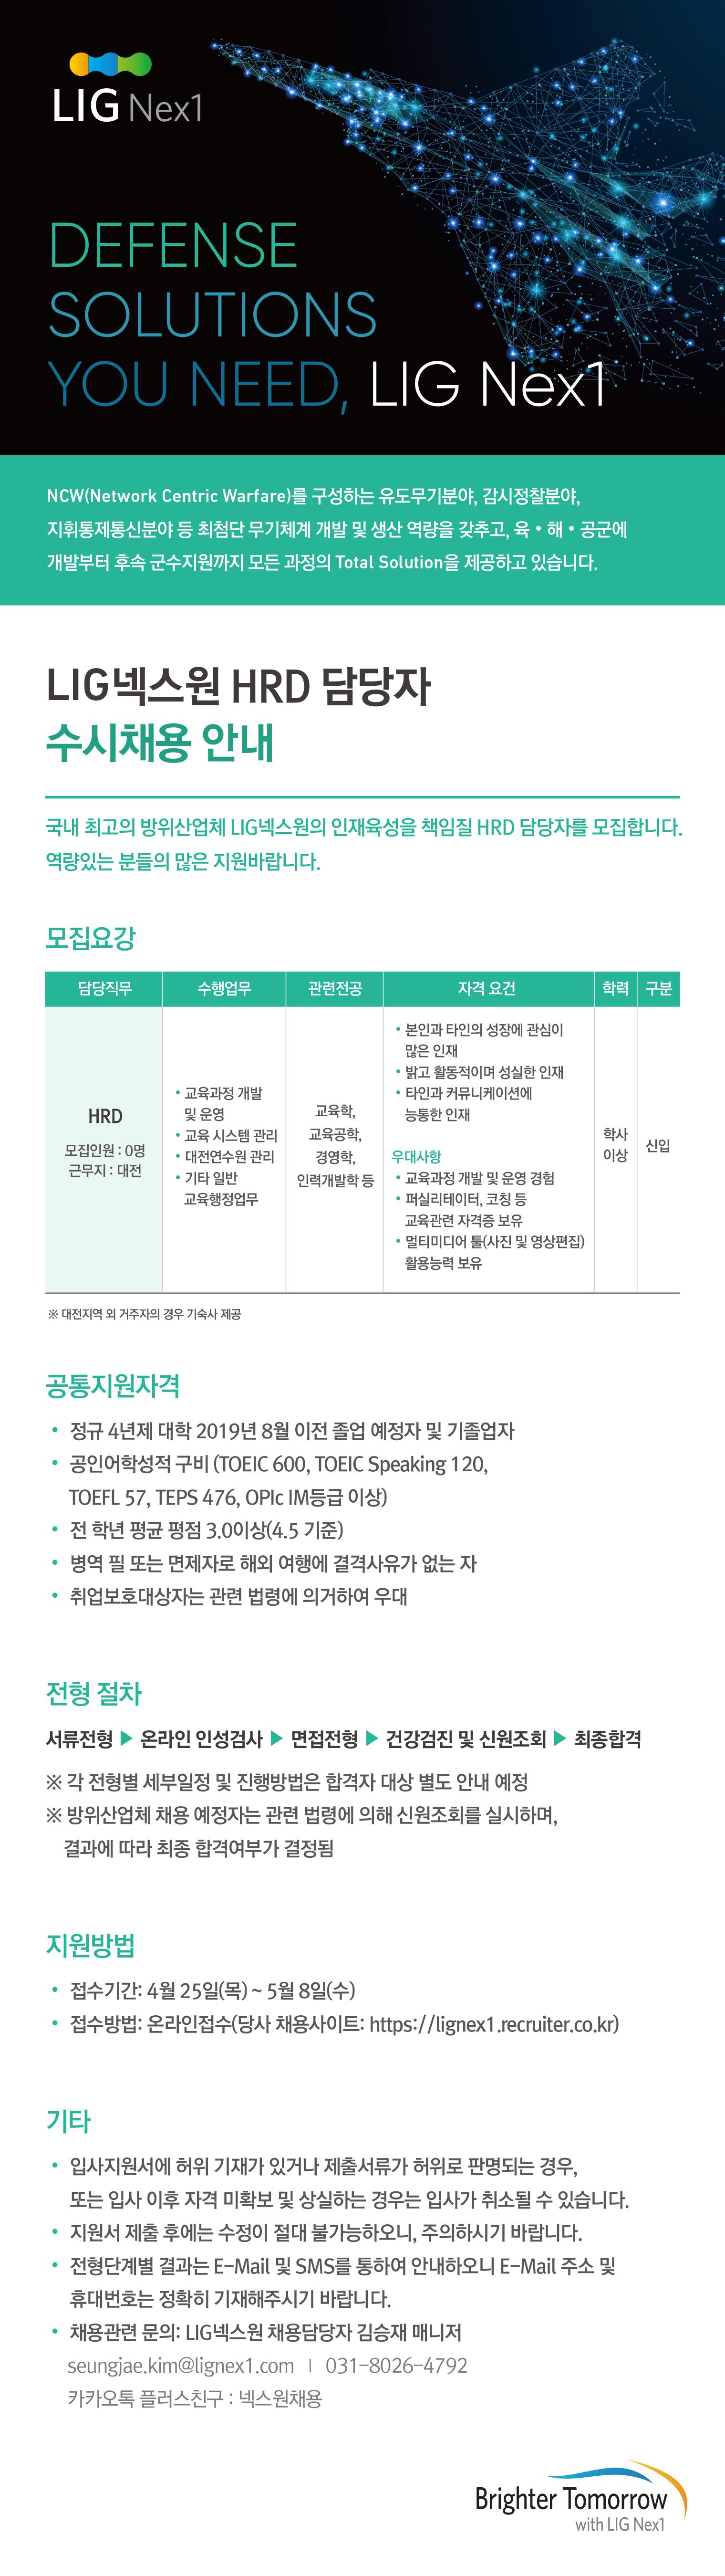 LIG넥스원_19상_HRD직무 수시채용 웹플라이어.jpg